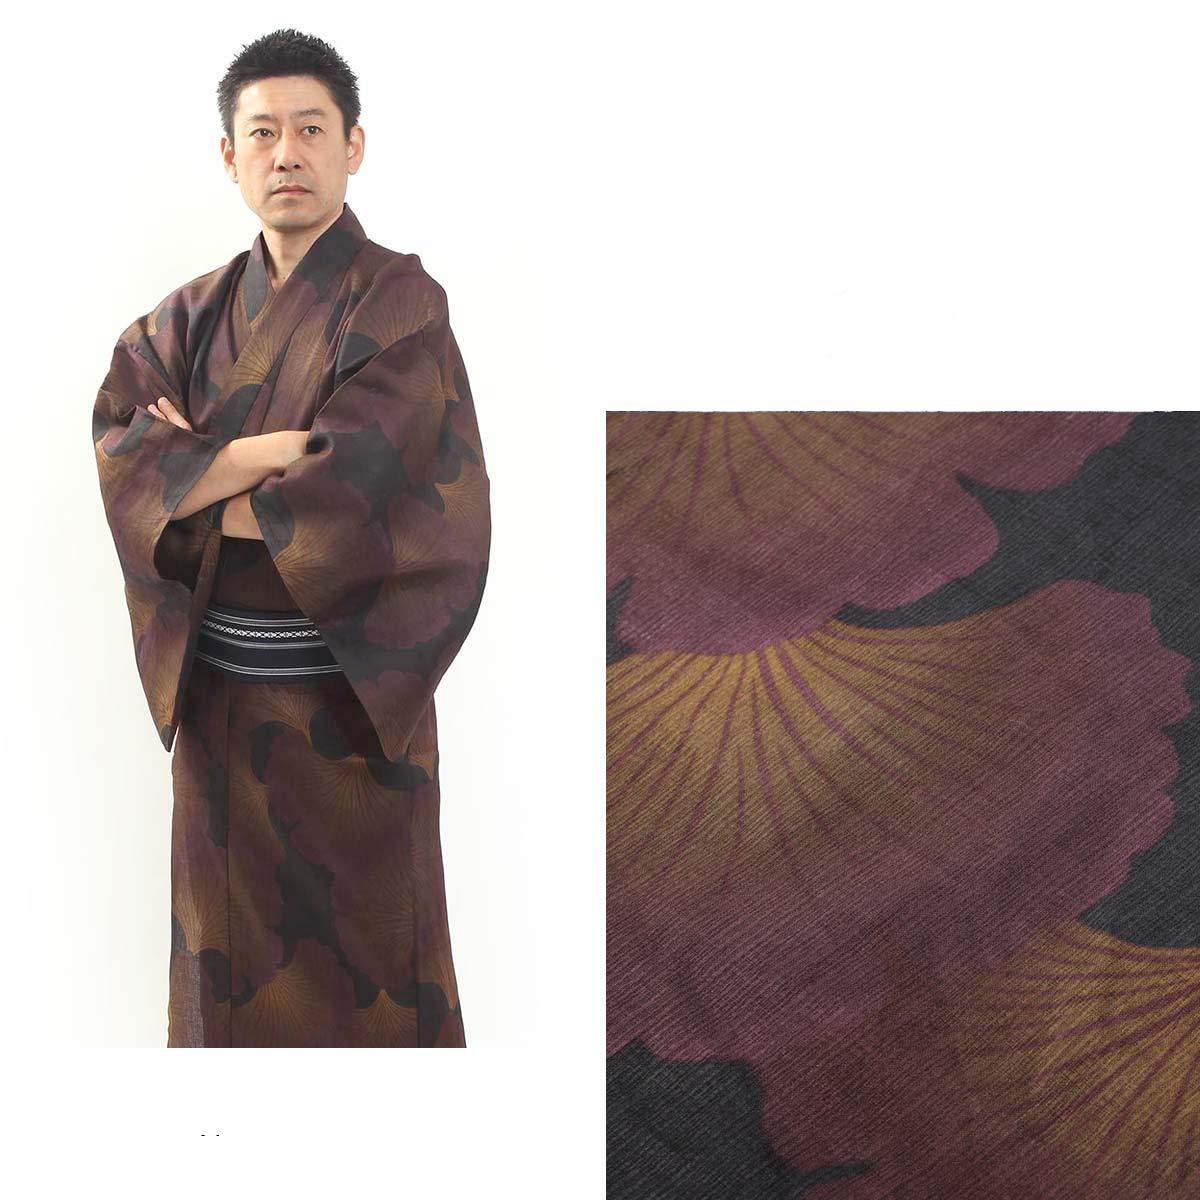 Kimono Ohkini Luxury Japanese Mens Summer Kimono Yukata LL Bronze